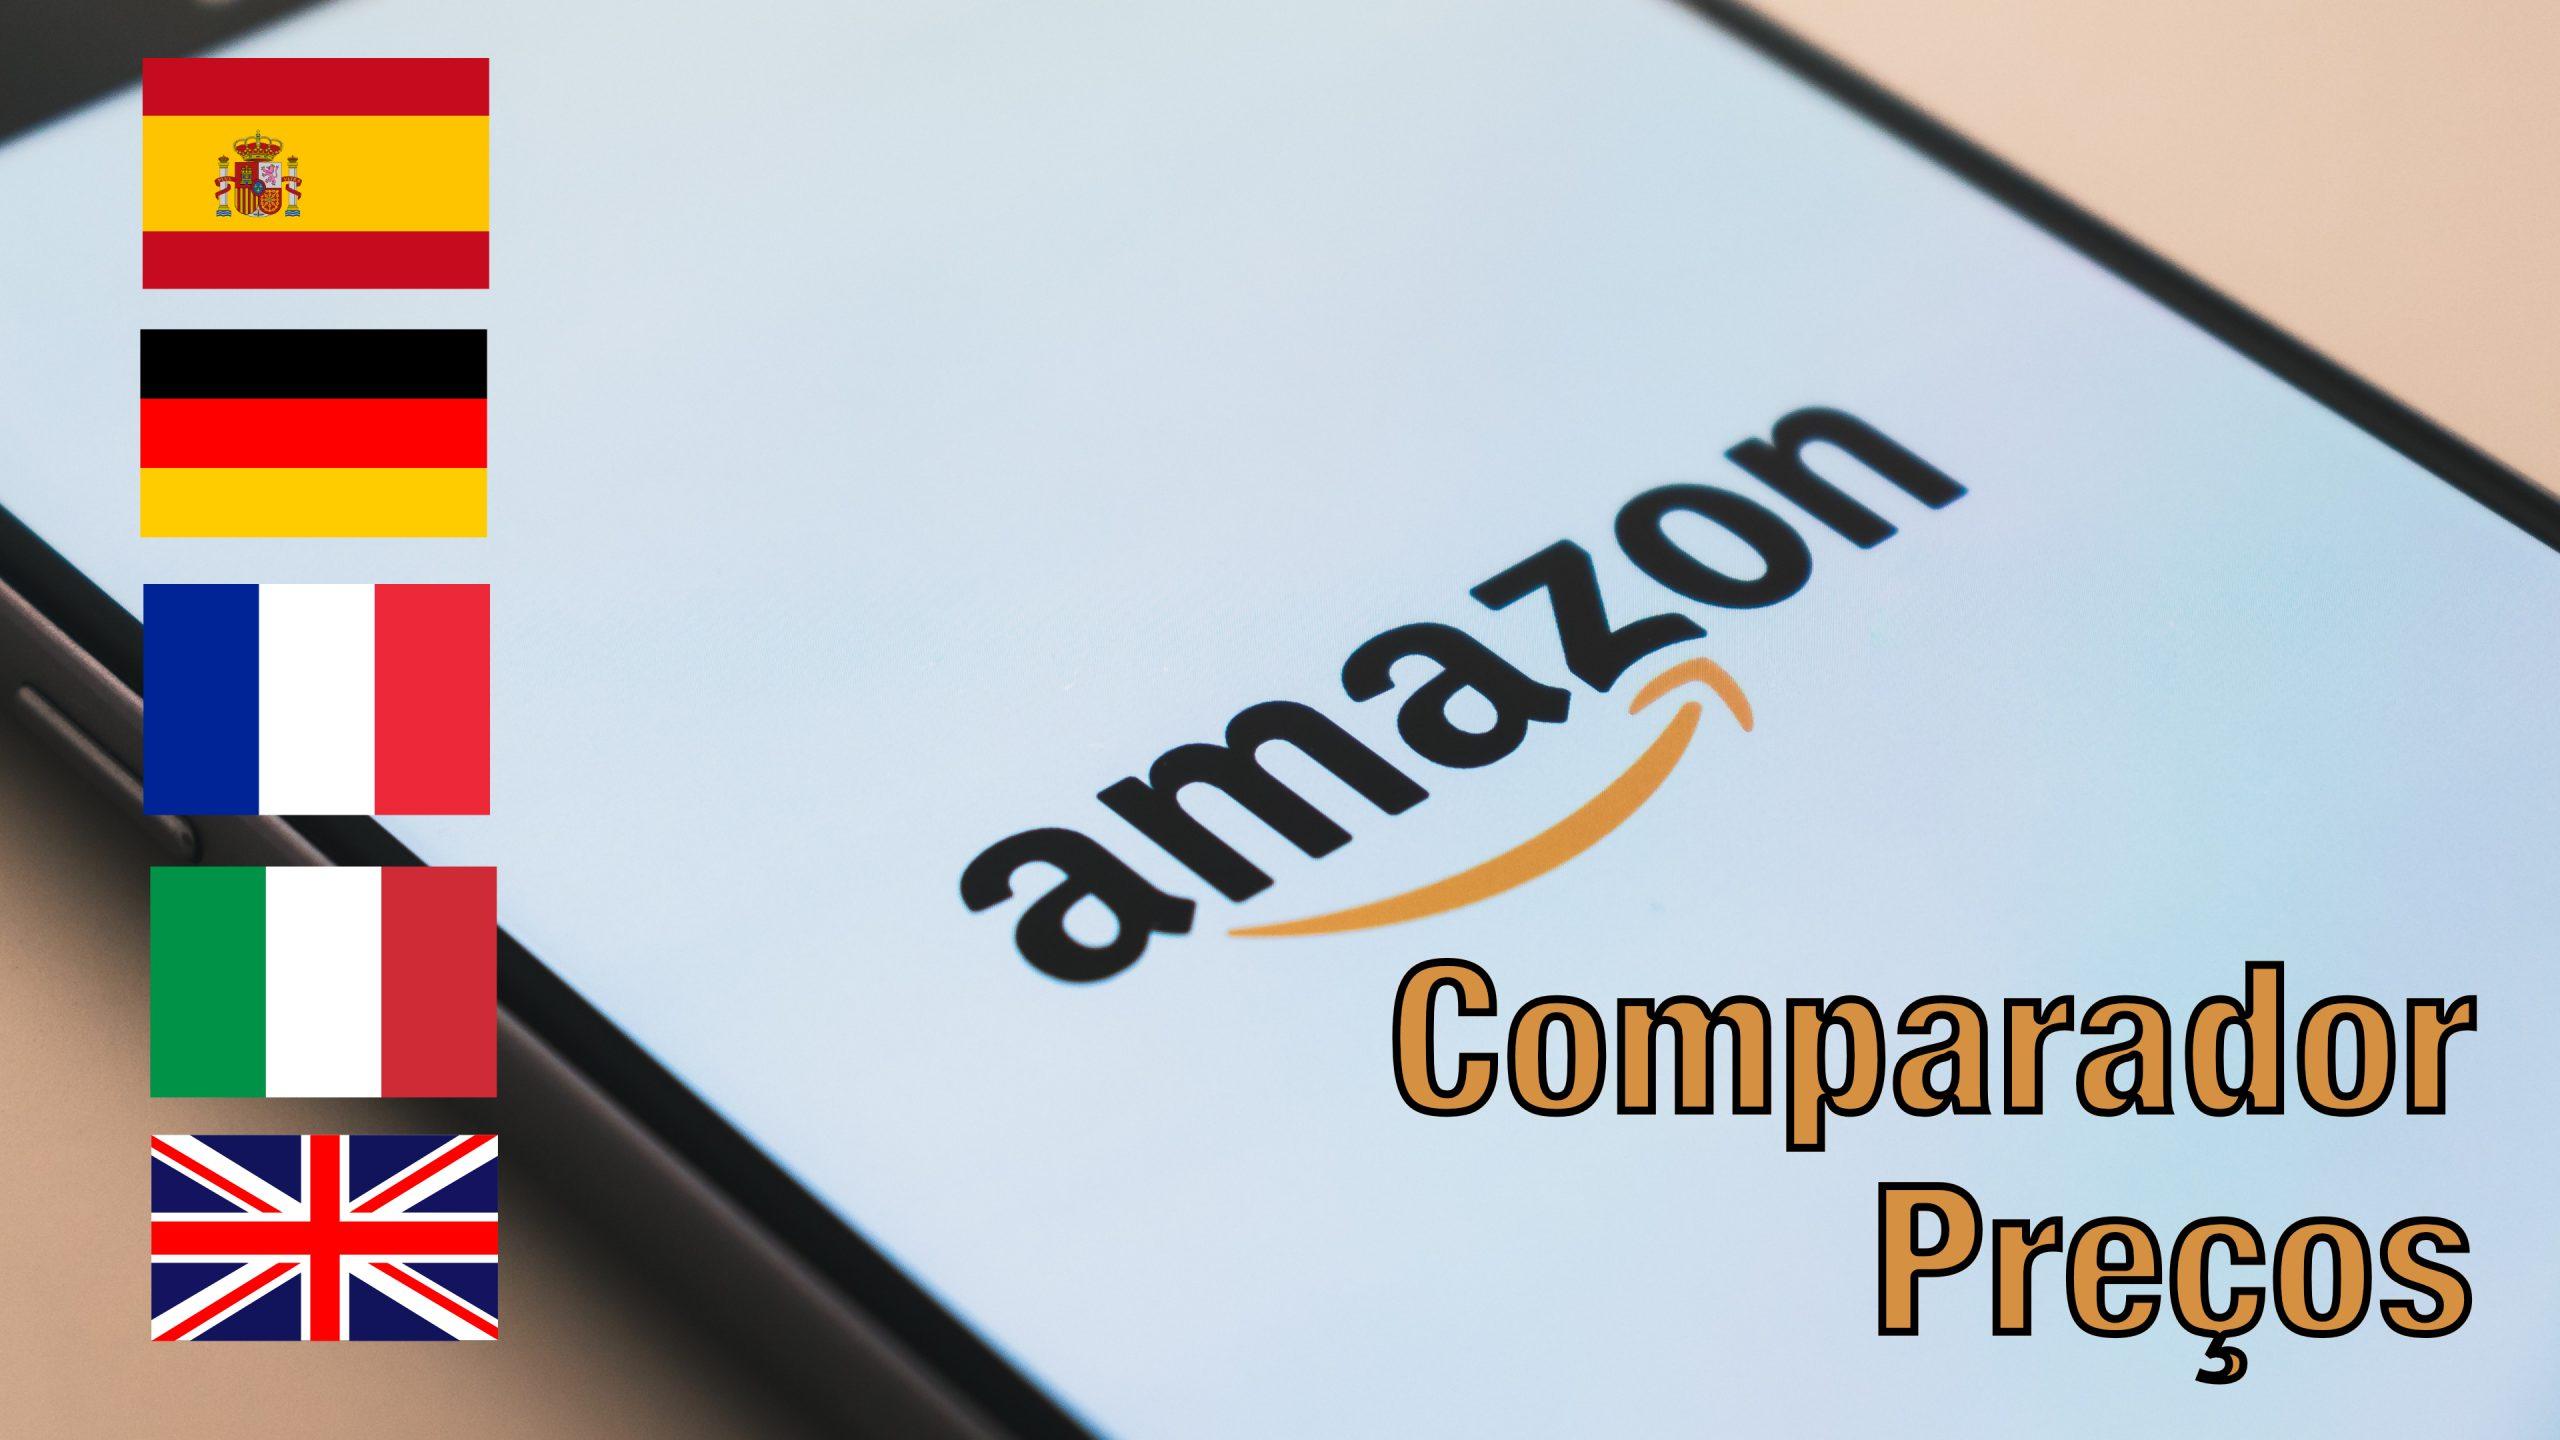 Comparador de preços da Amazon